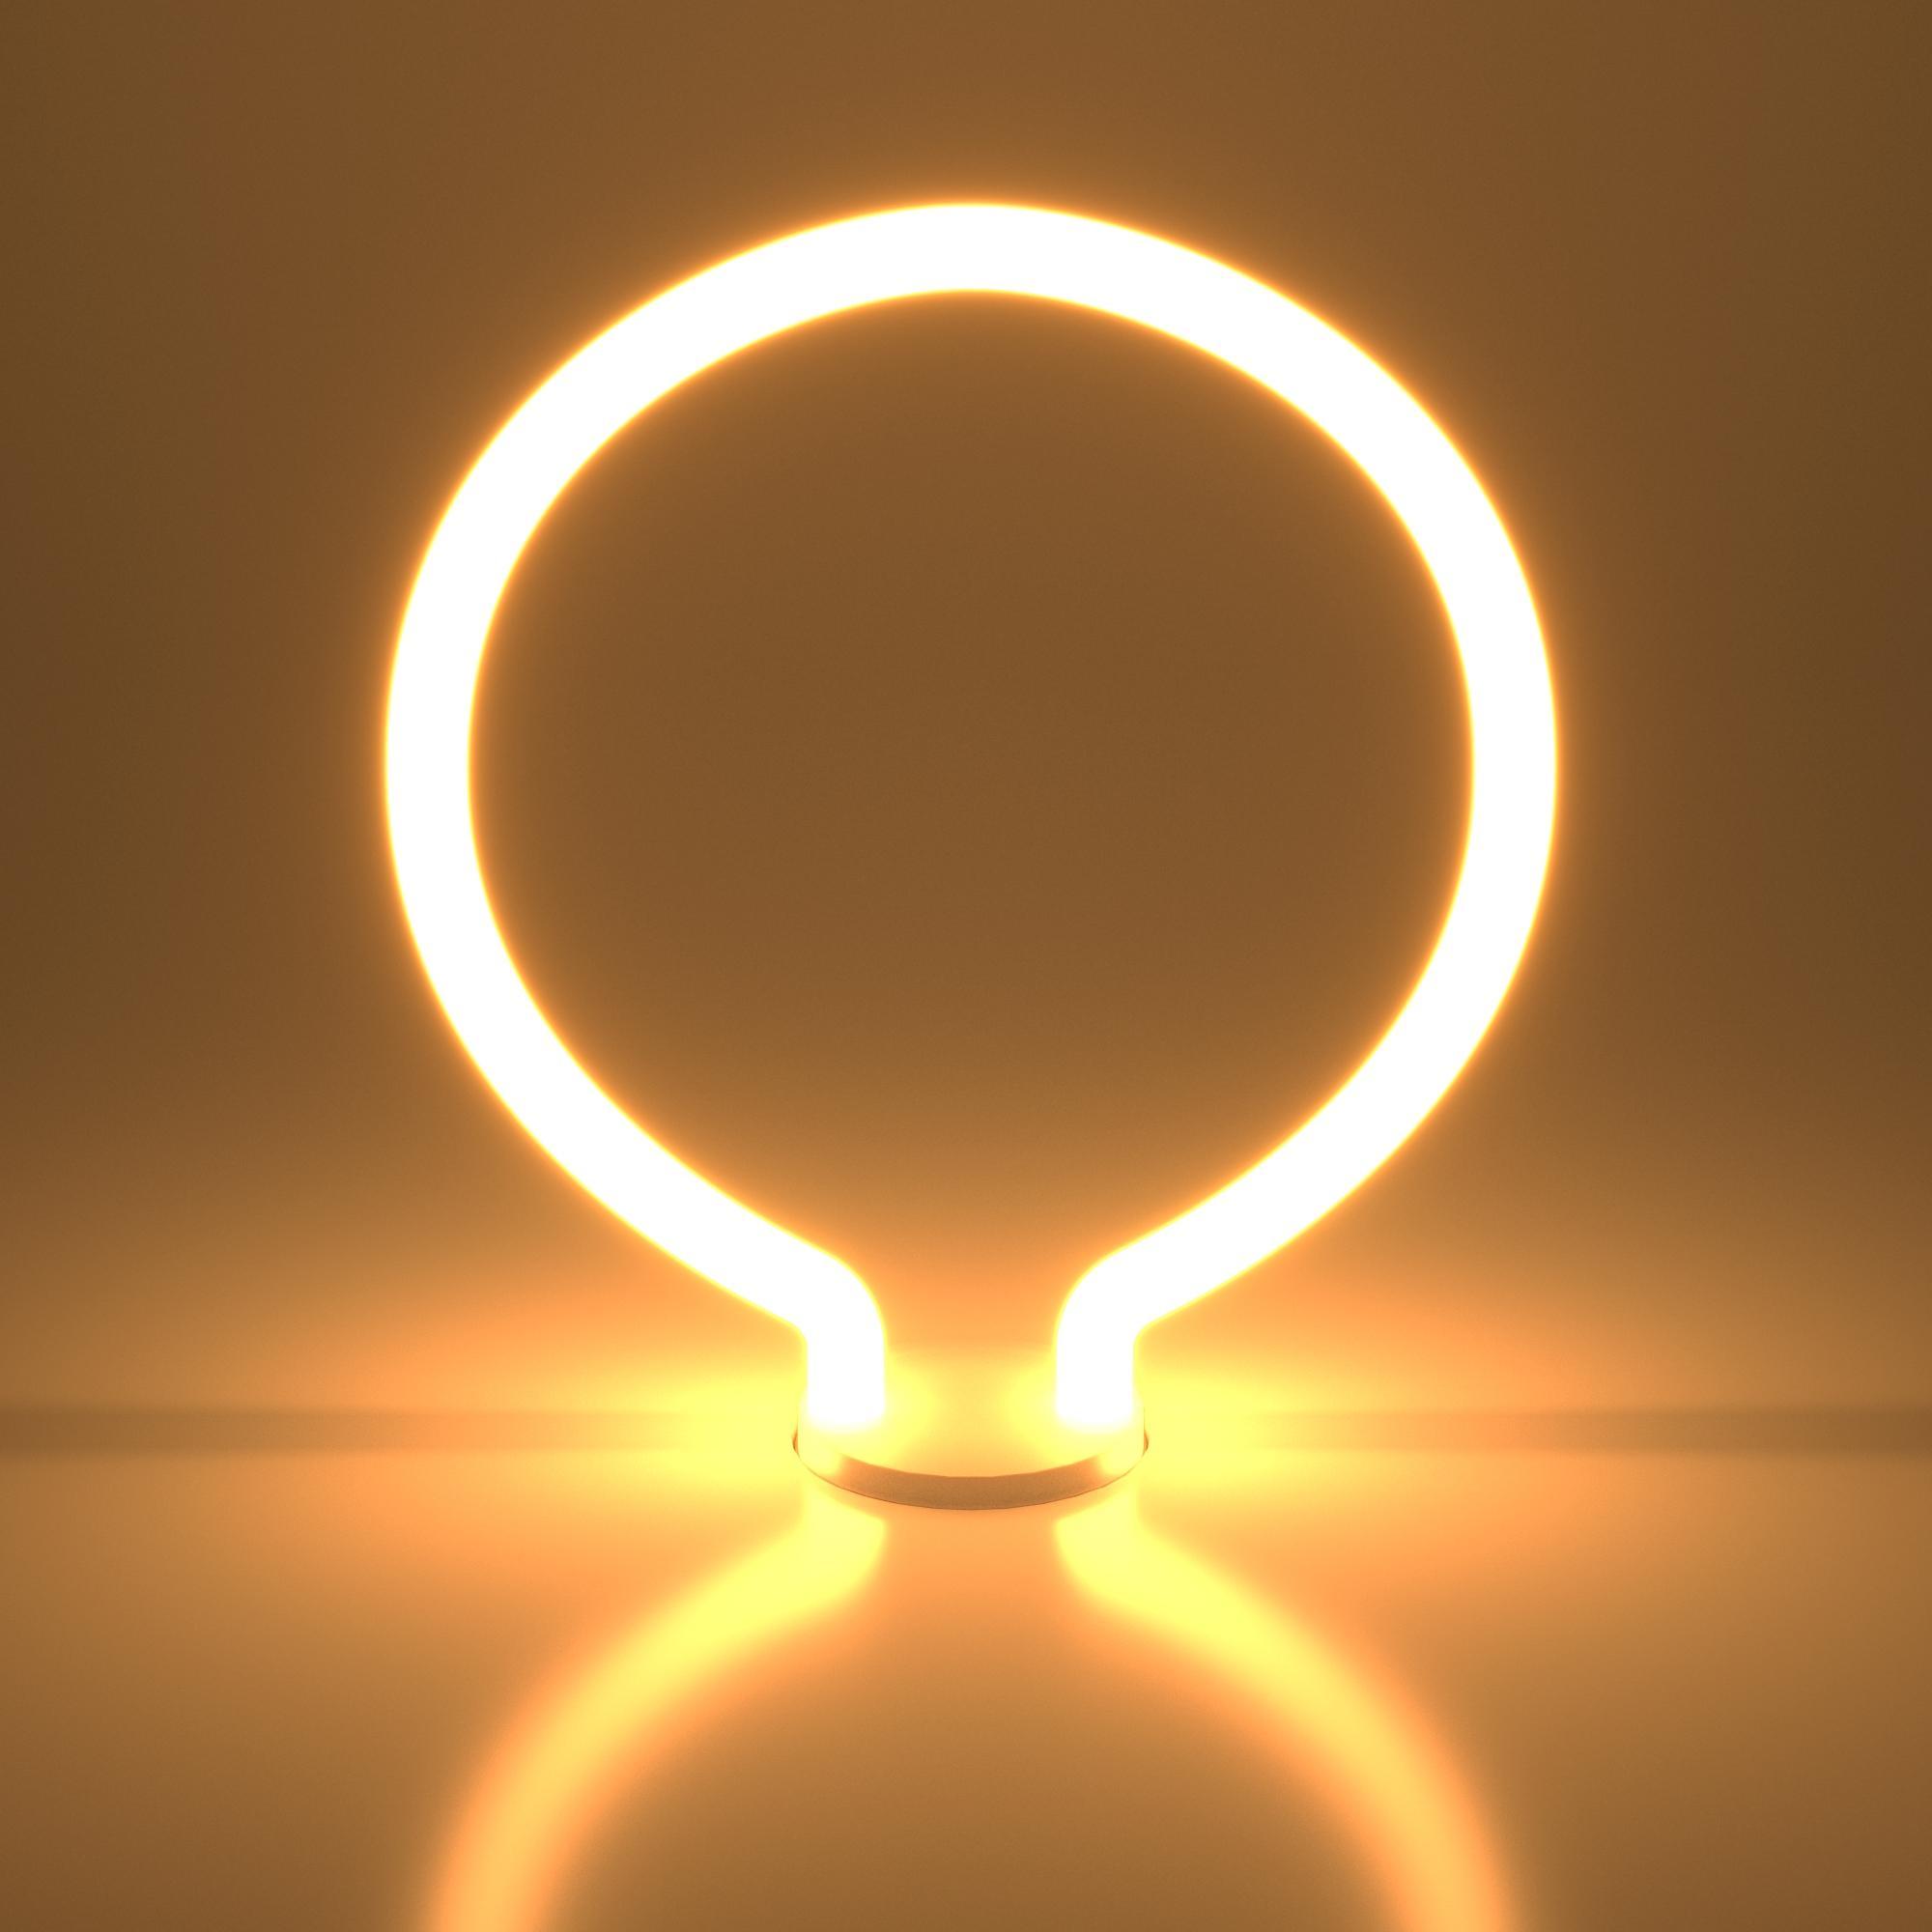 Decor filament 4W 2700K E27 round белый матовый (BL156)